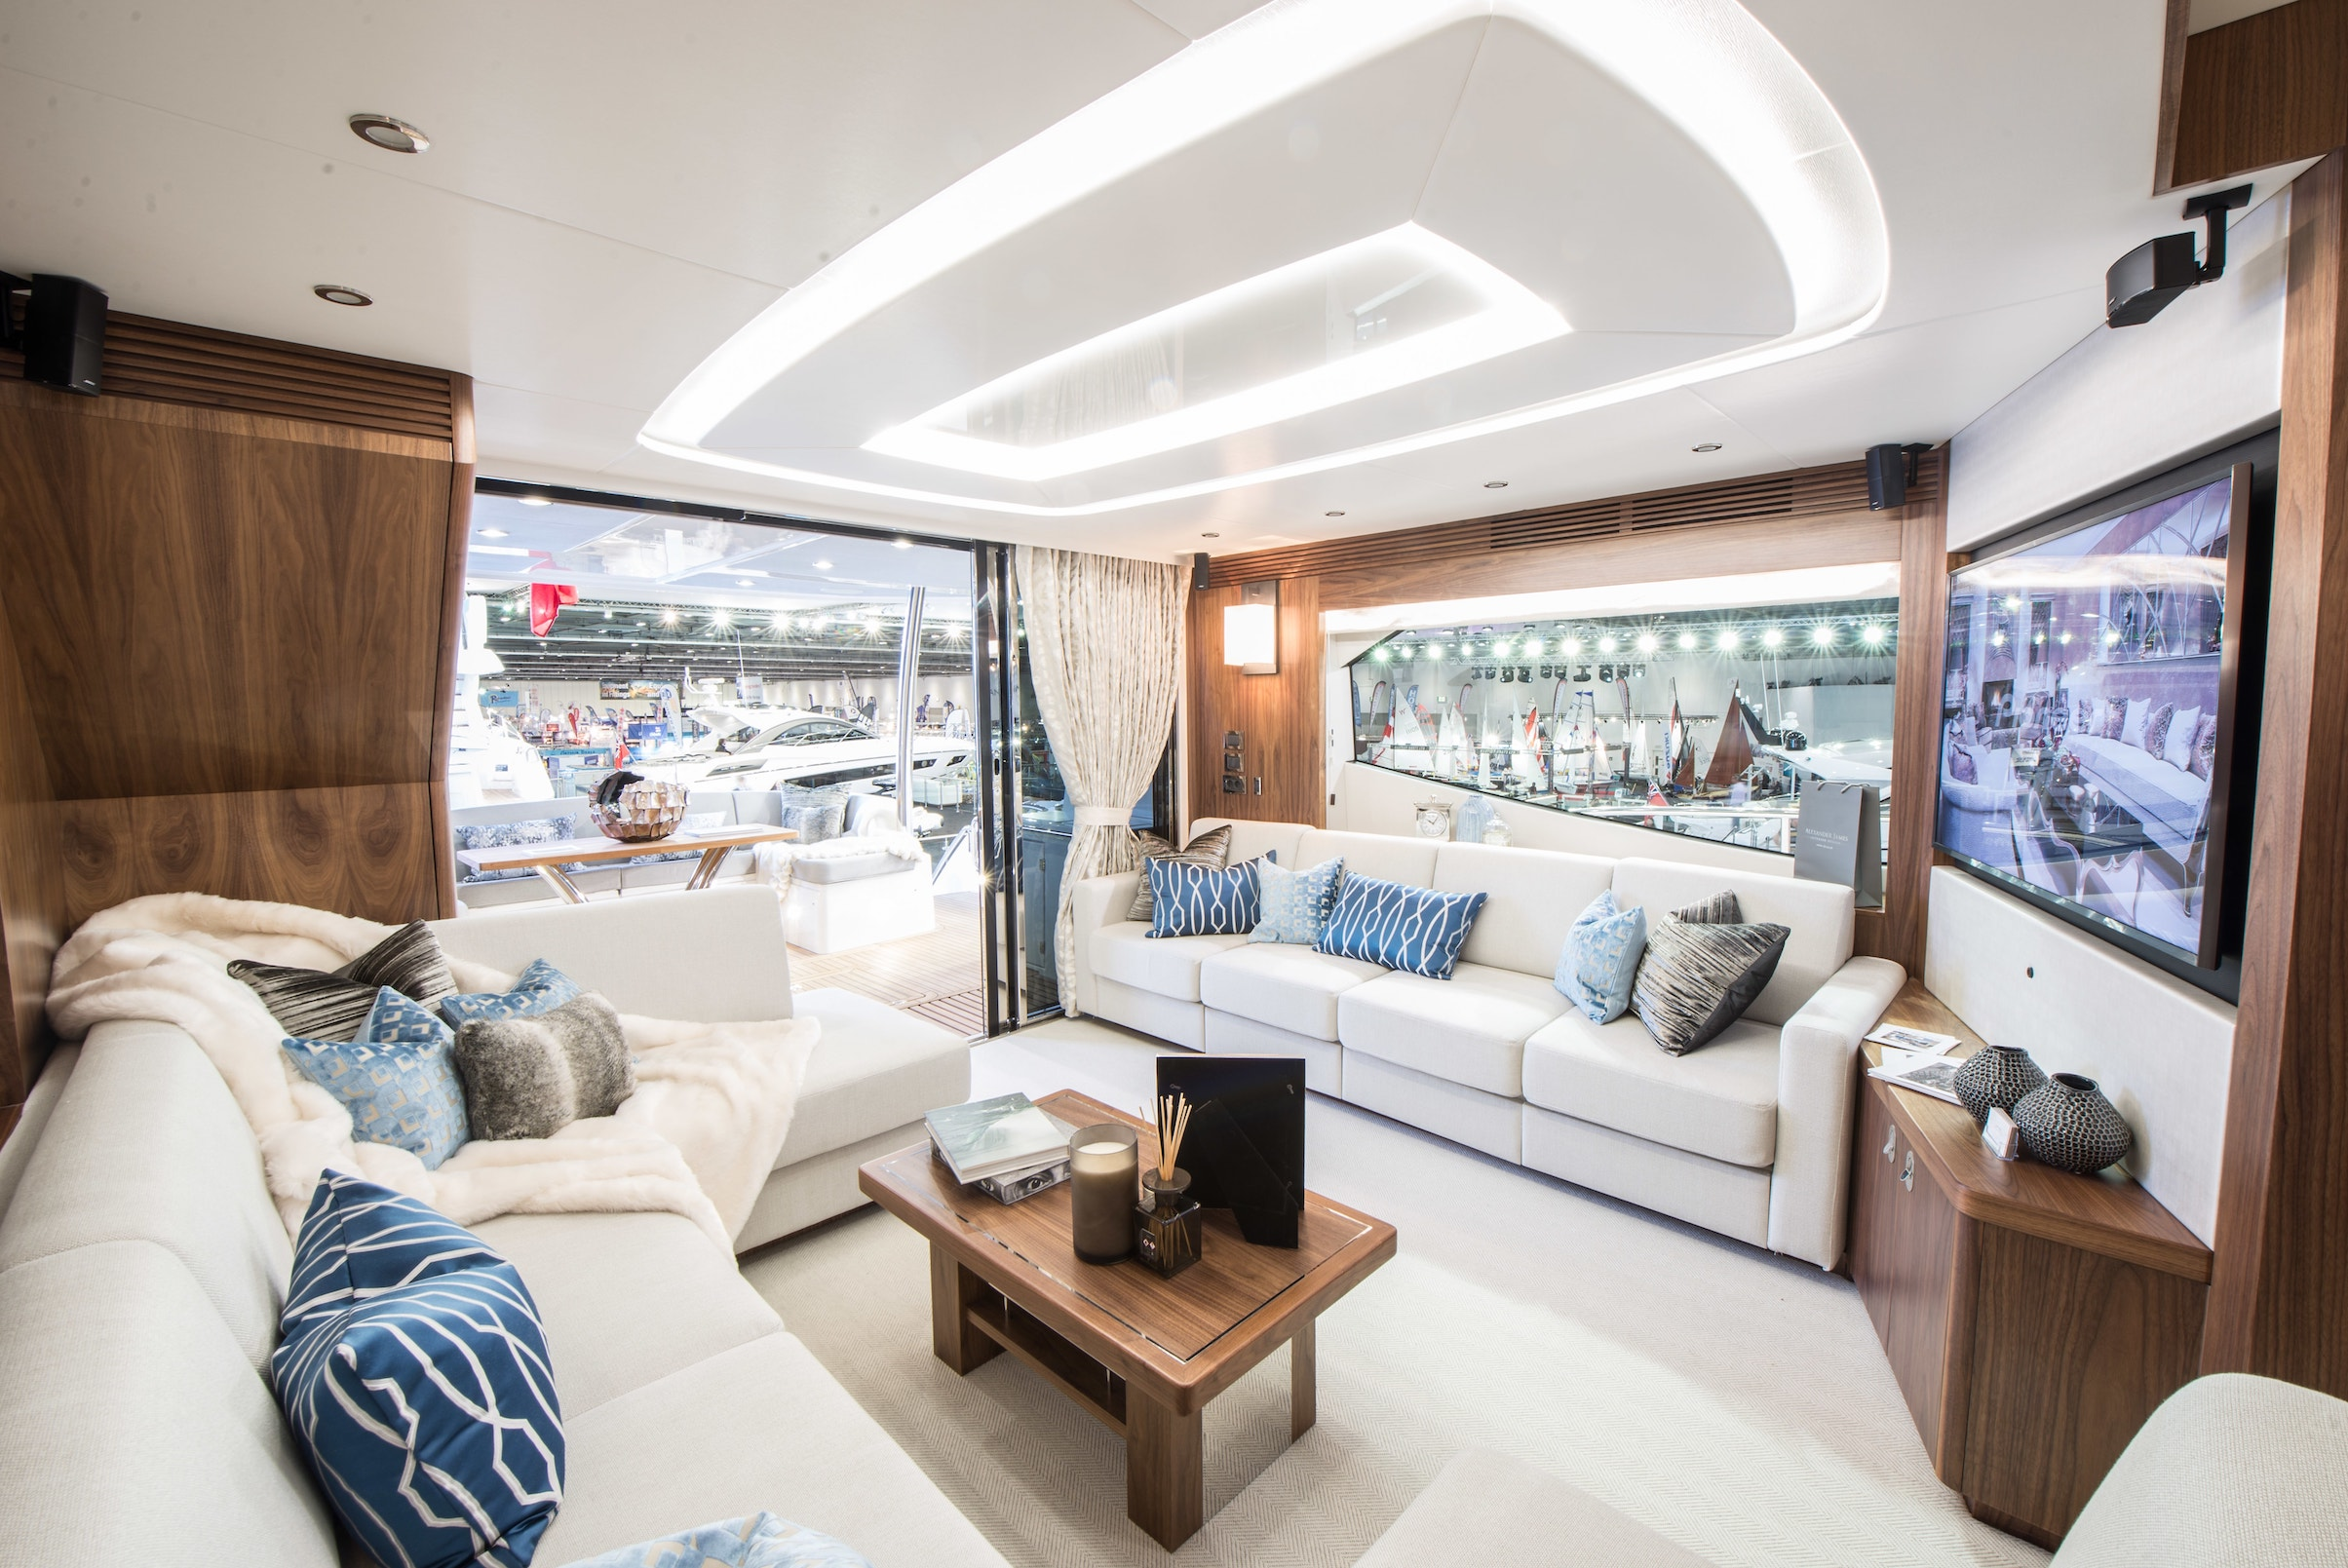 Light and modern interior